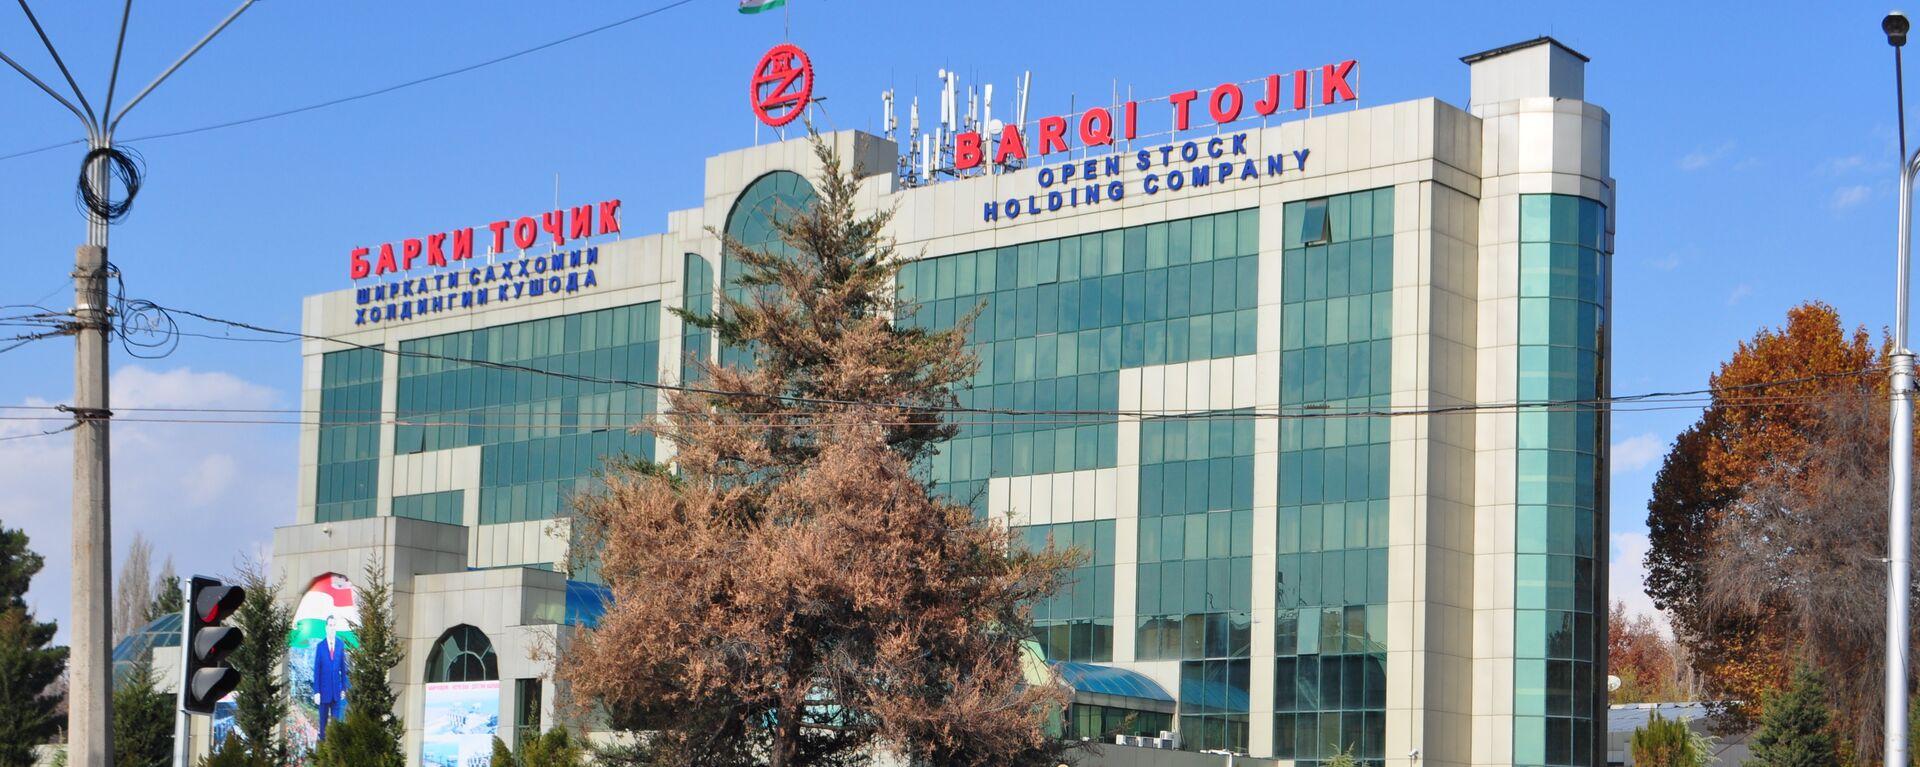 Здание энергохолдинга Барки точик, архивное фото - Sputnik Таджикистан, 1920, 17.02.2021